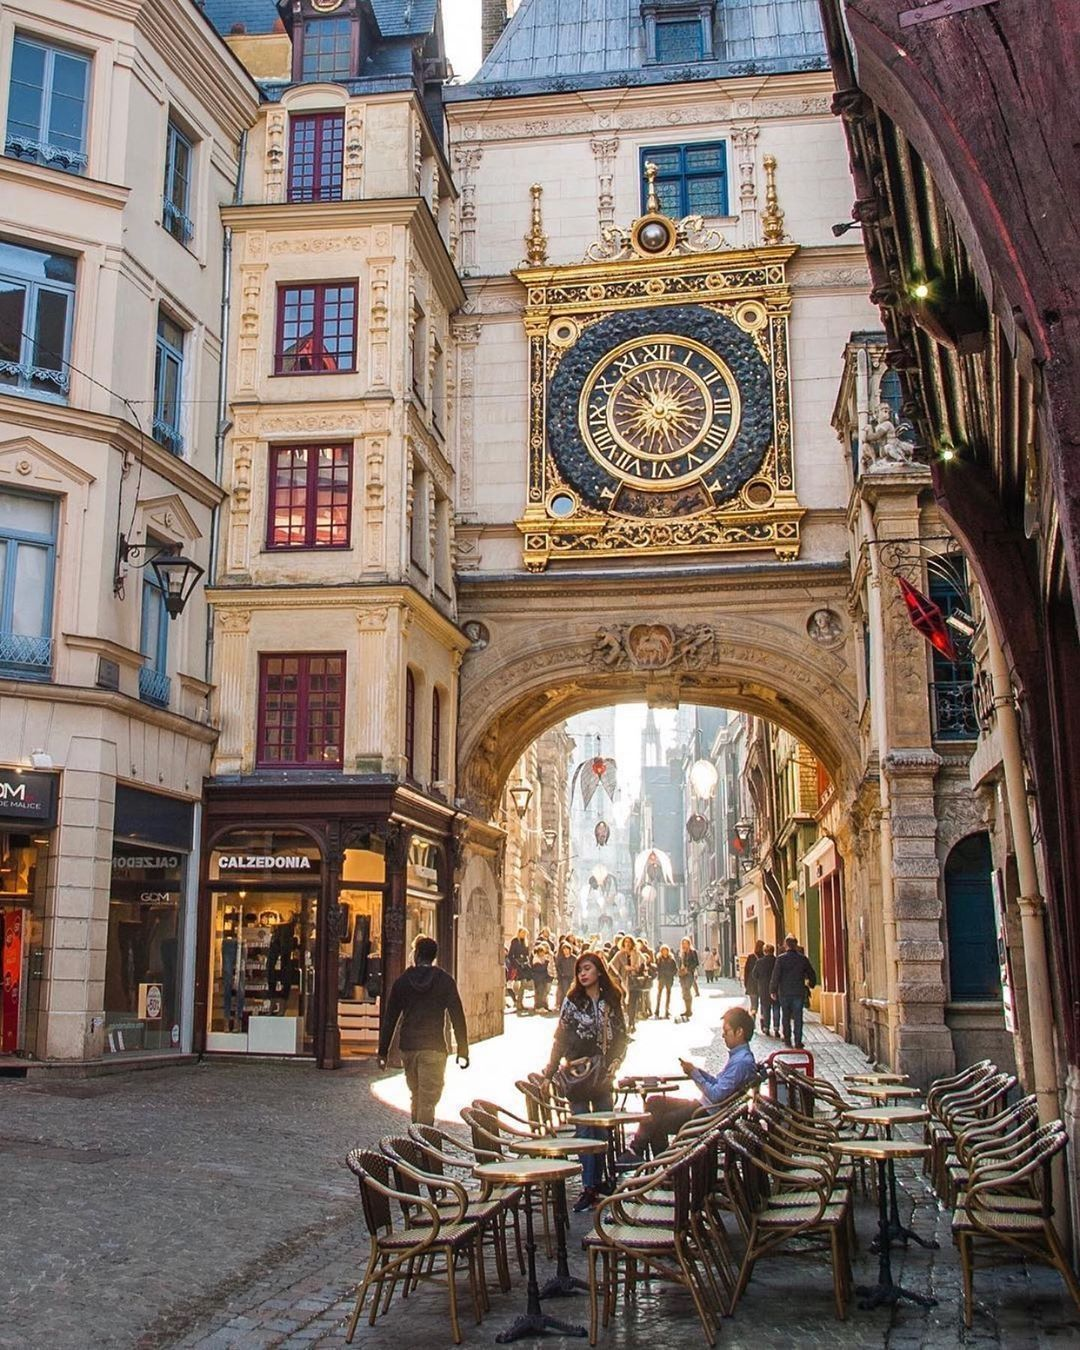 City Best Views On Instagram Rouen France Alexislnt Follow Citybestviews For The Best Urban Photo Fr Rouen Rouen France France Travel